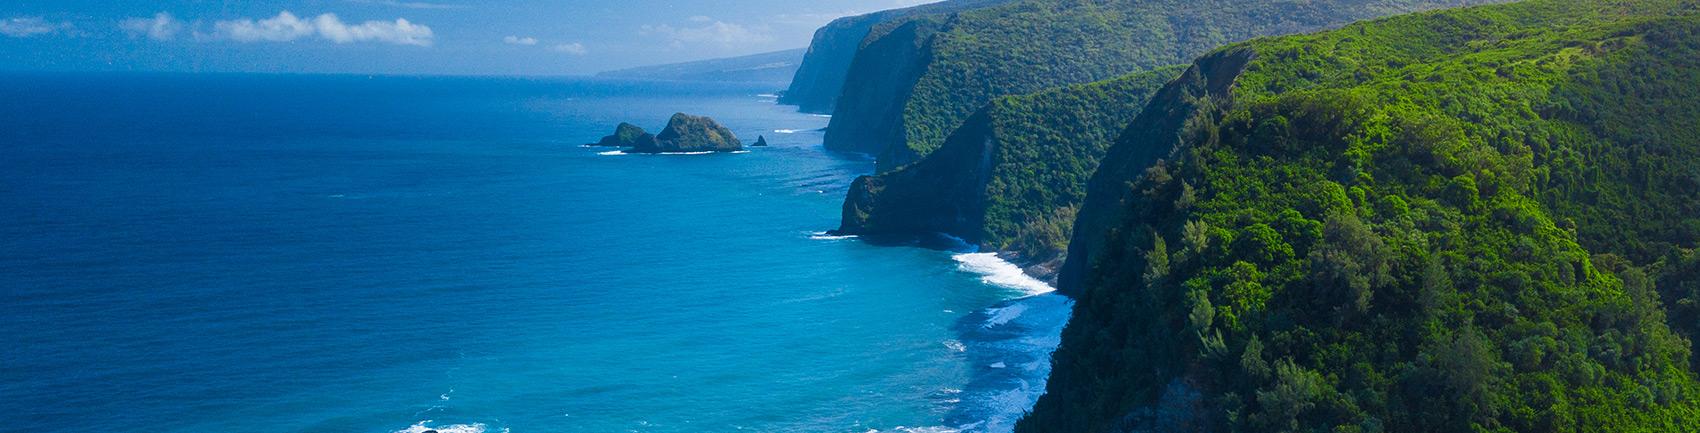 View of Big Island